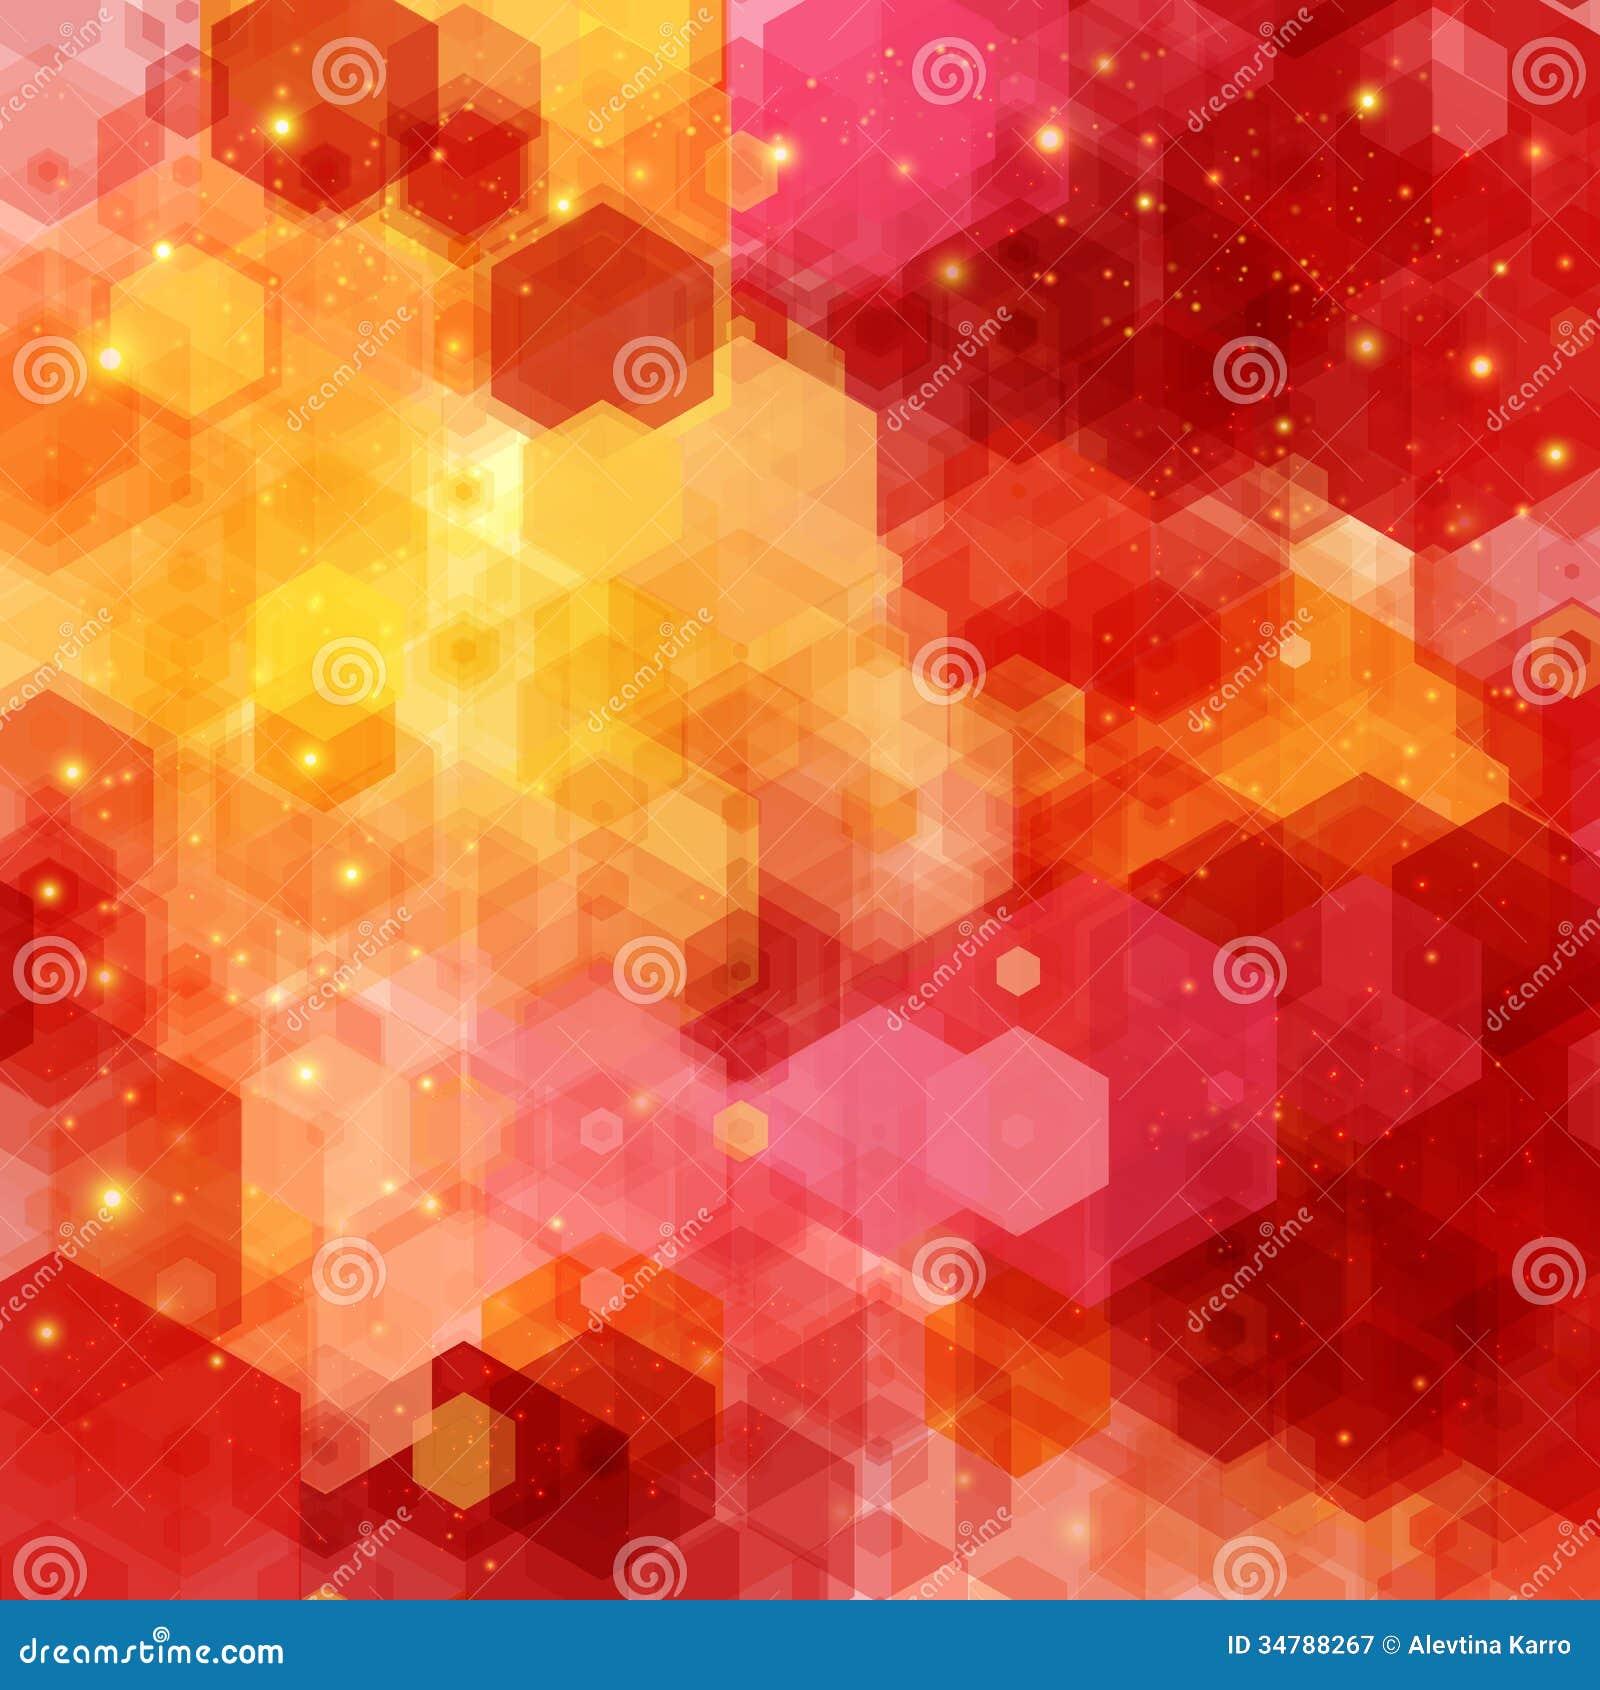 3d hexagon pattern stock vector image 54997696 - Design Hexagon Illustration Pattern